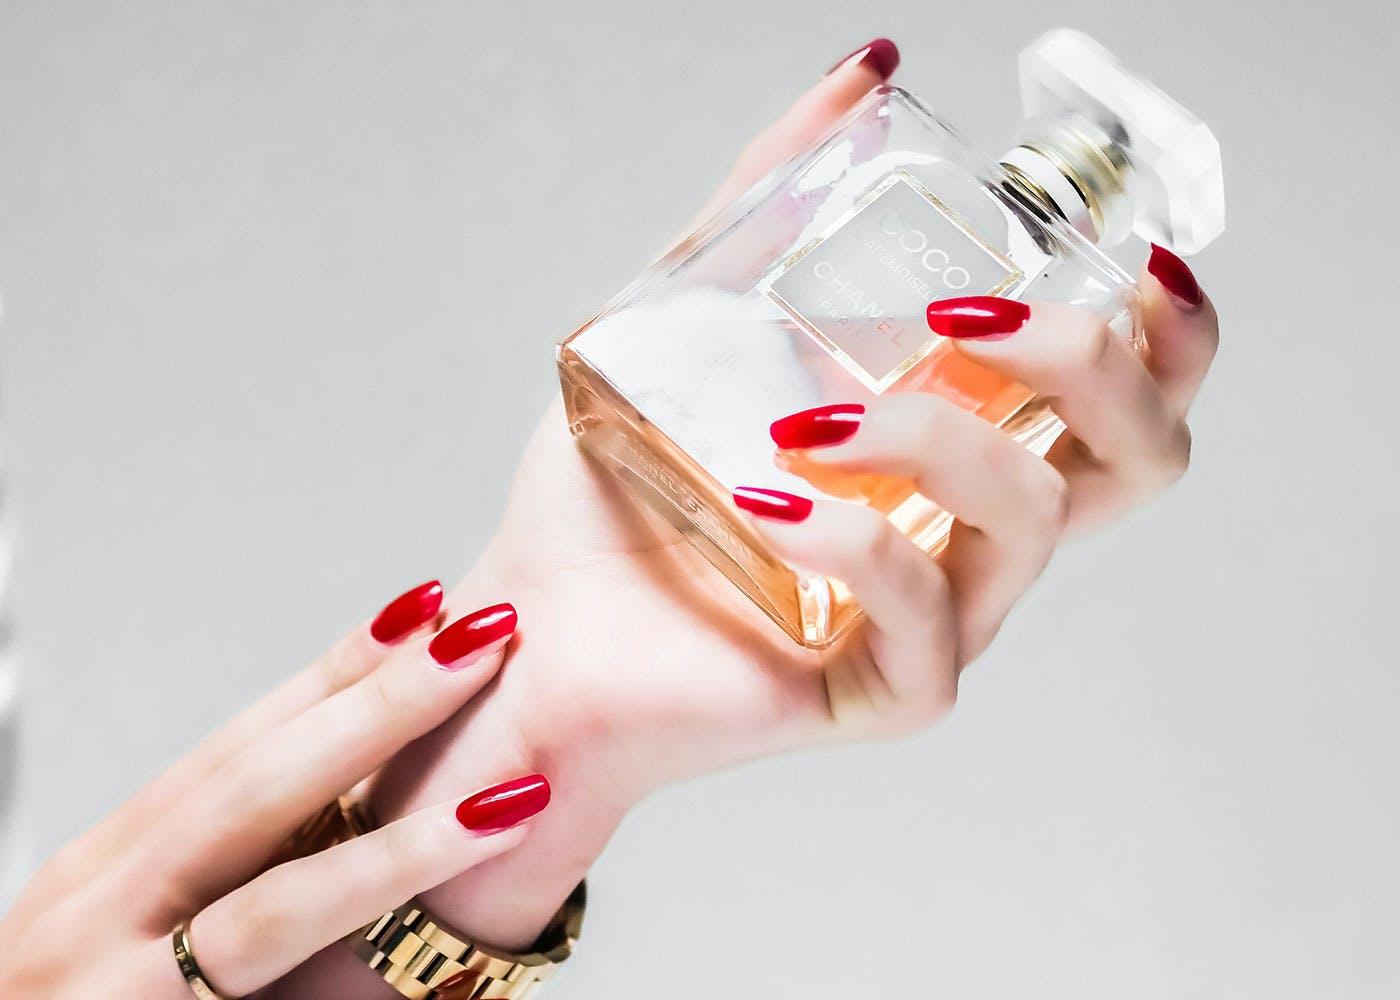 Woman modeling Coco perfume